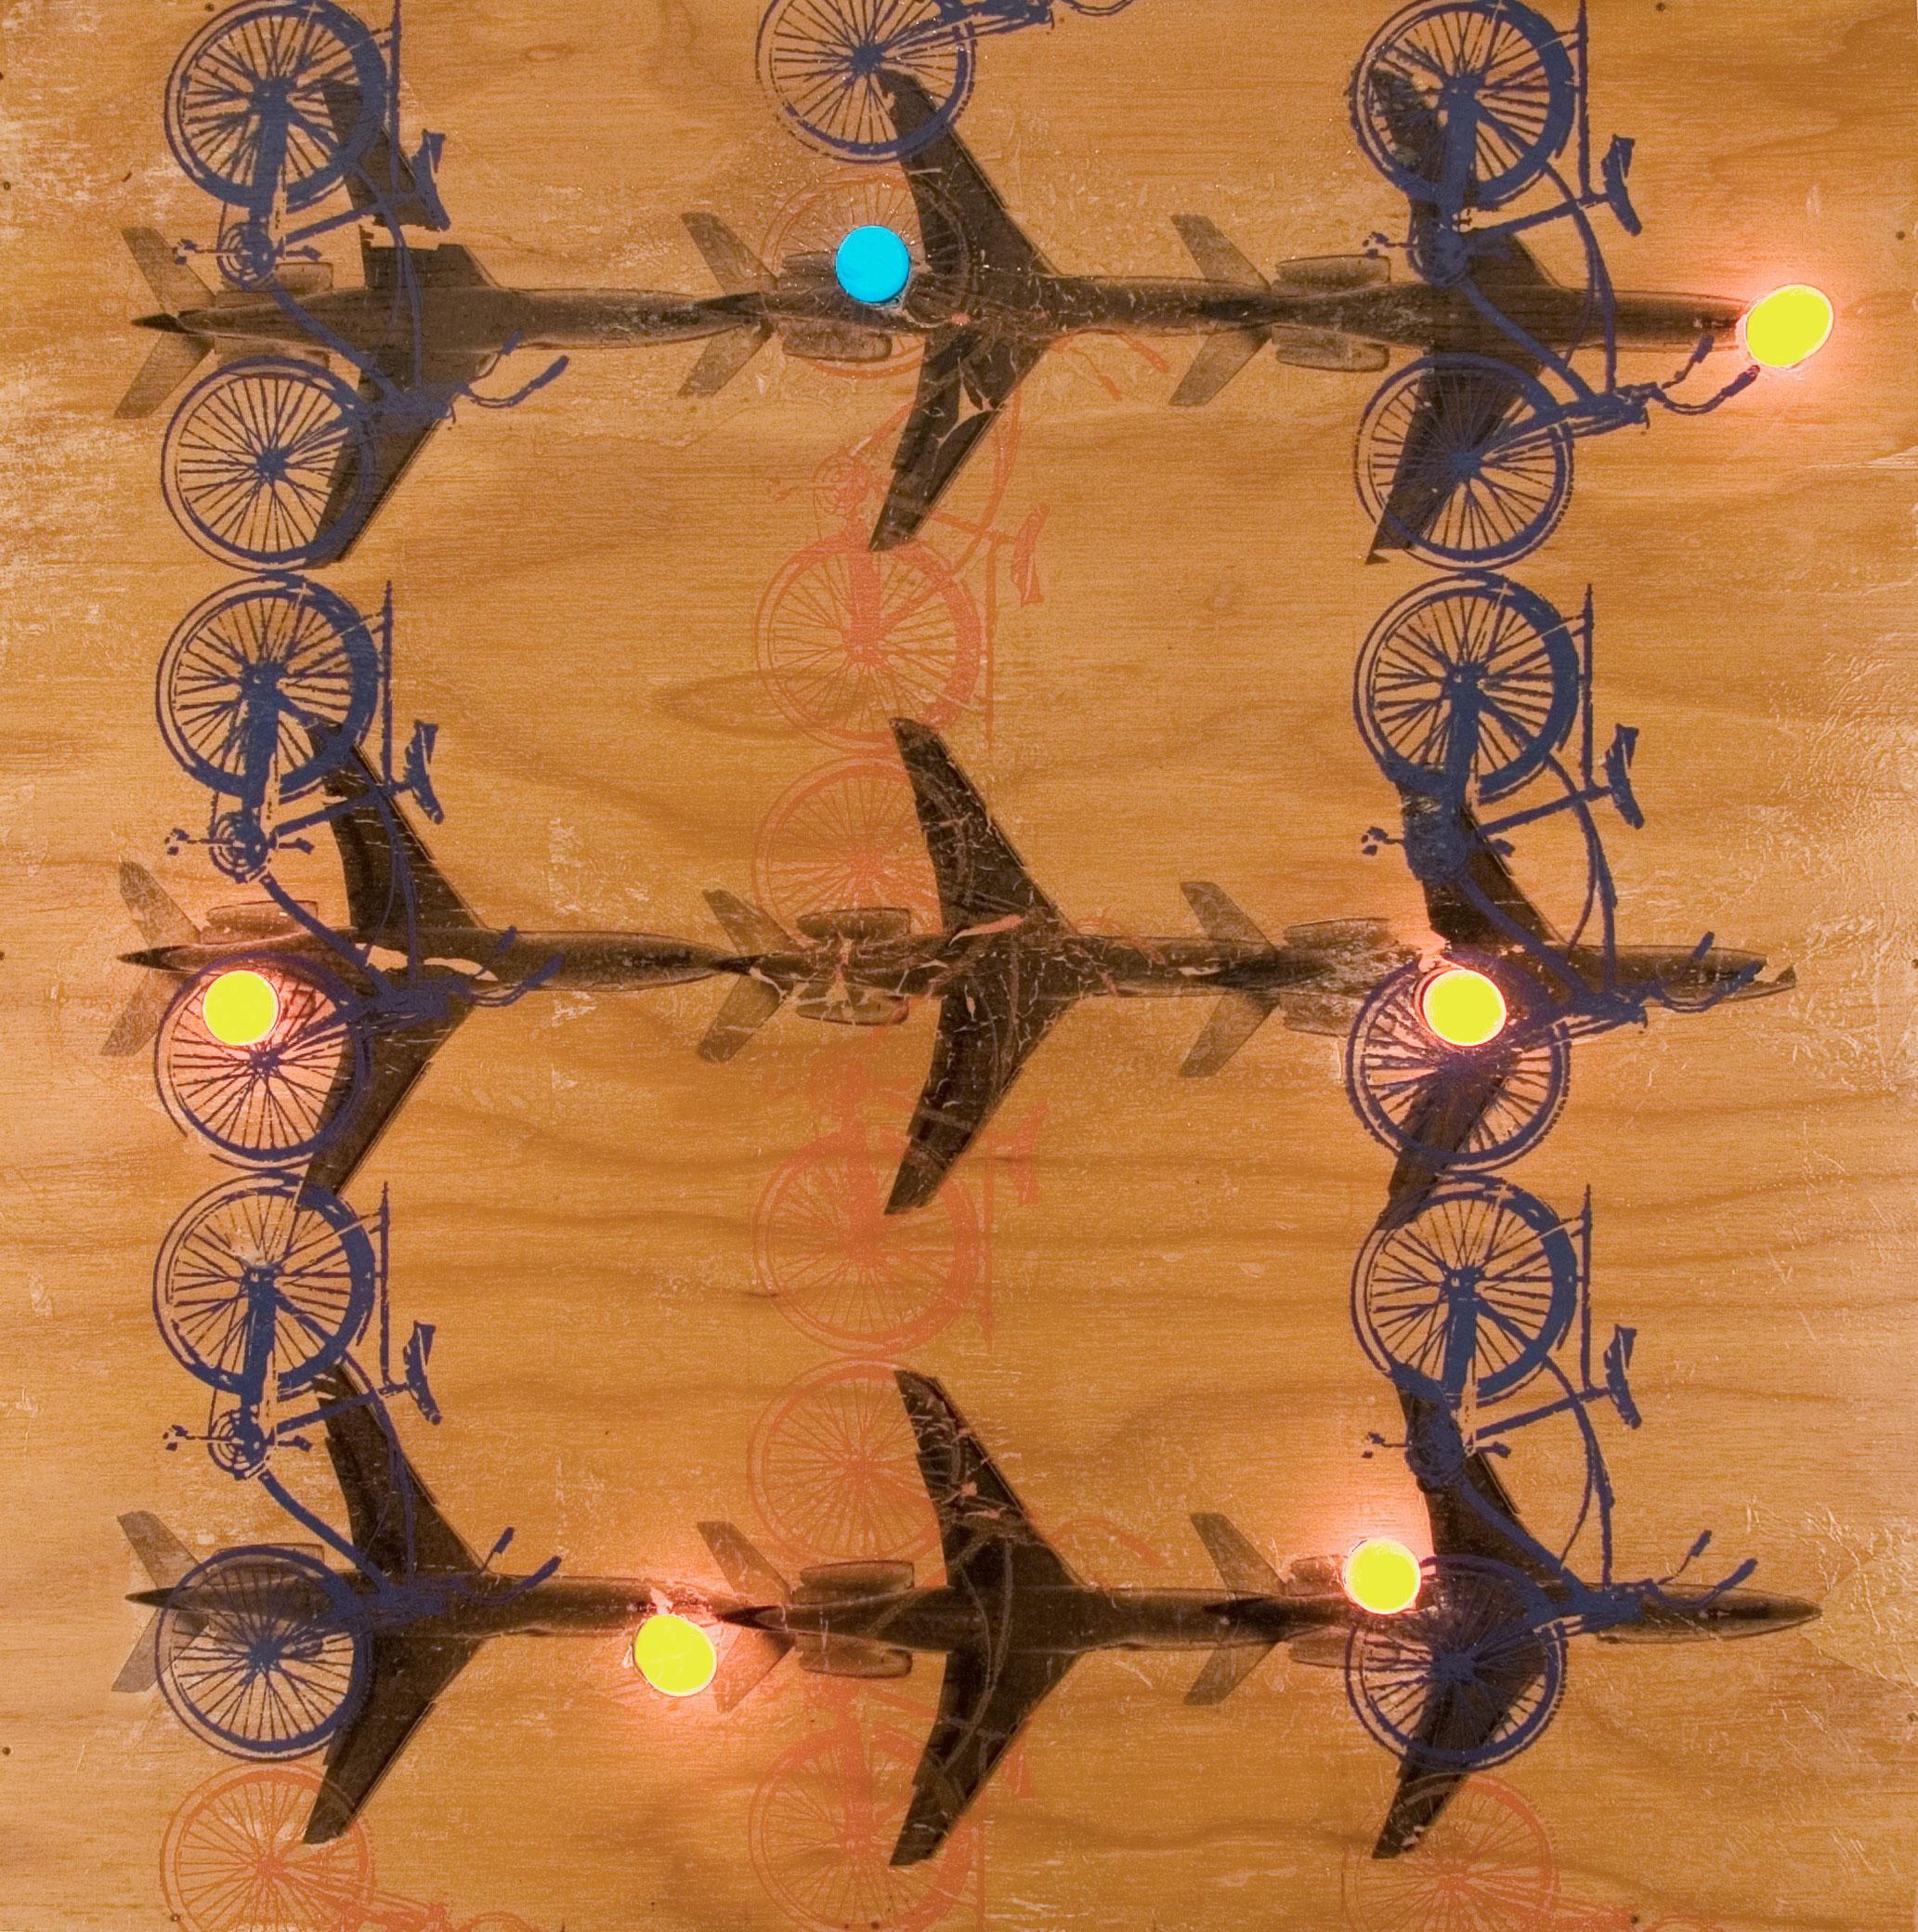 Lightspeed-2-(2009).jpg